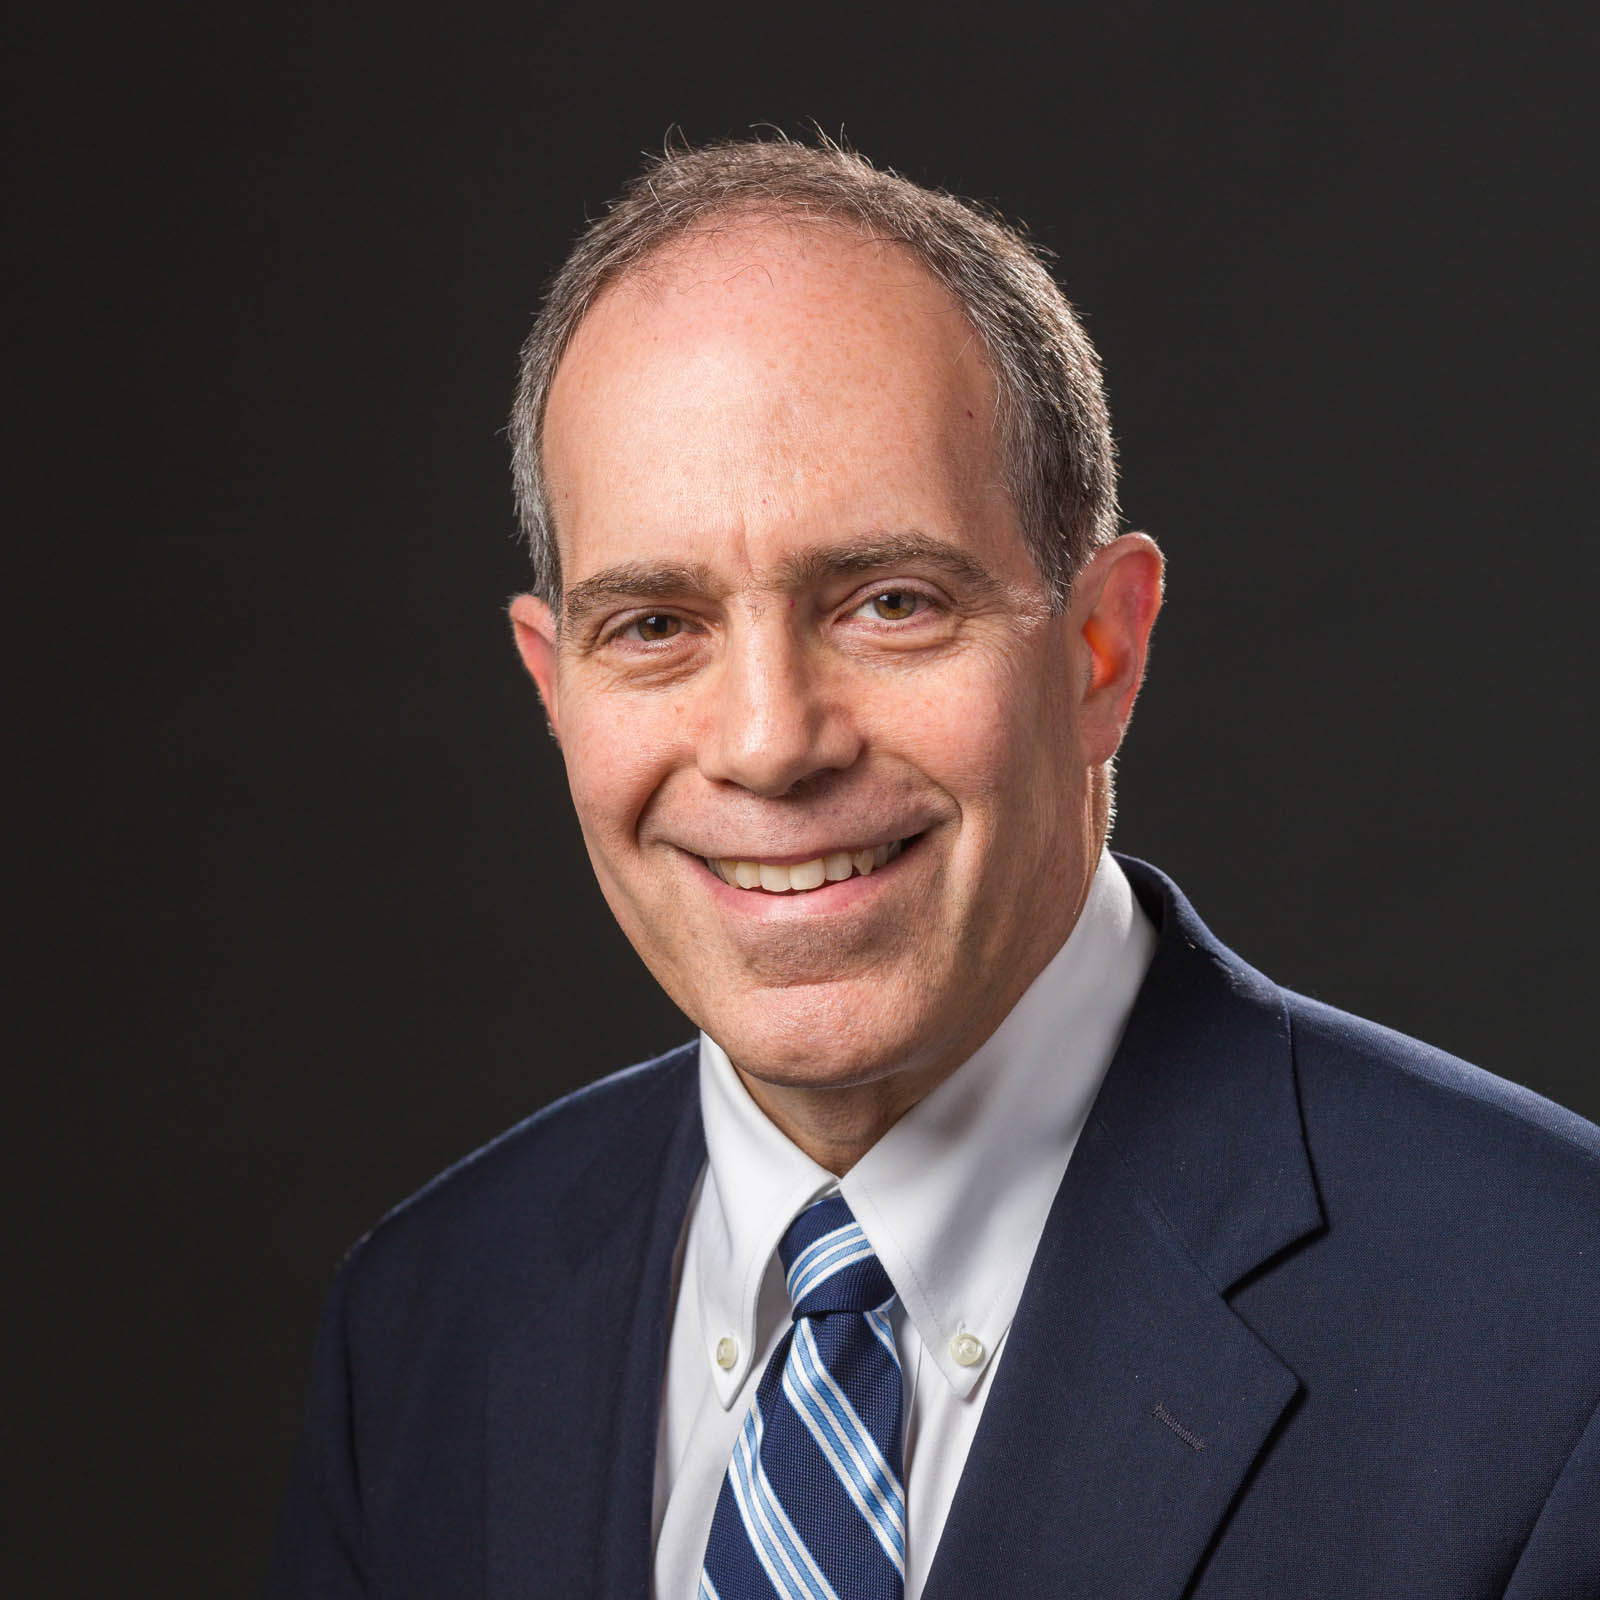 Michael Nathanson